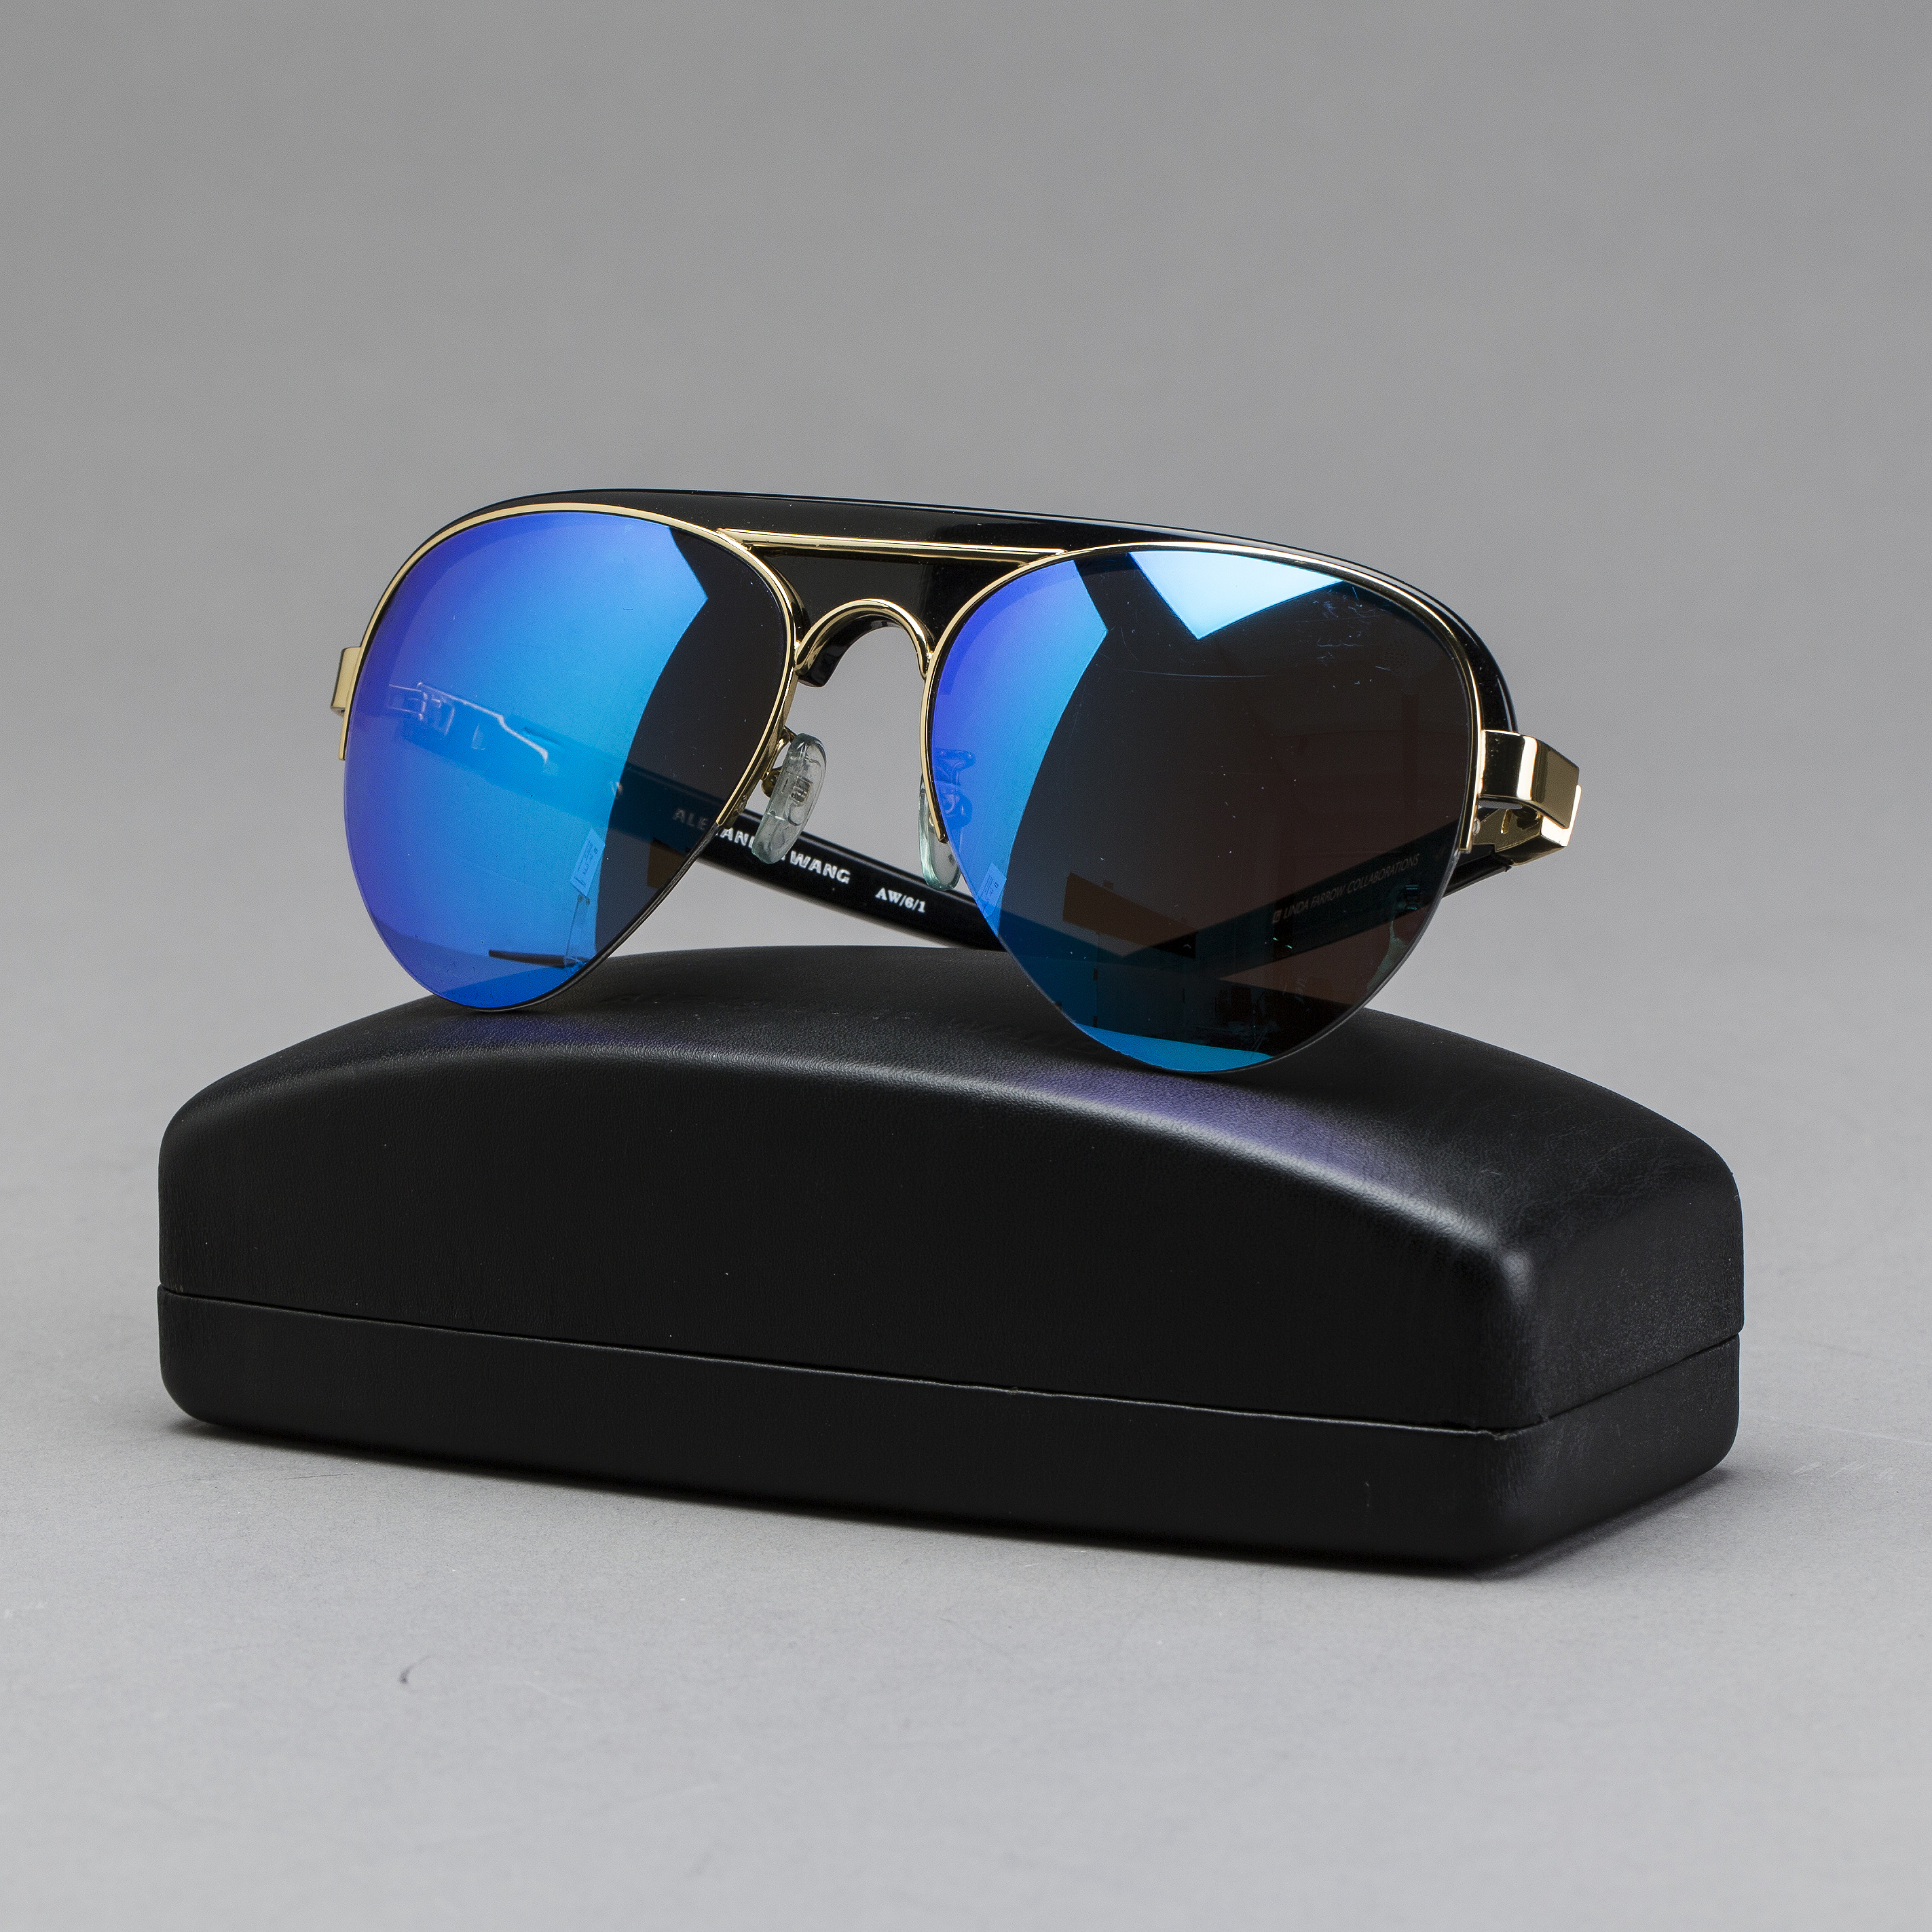 26ec1a2bf5 Alexander Wang sunglasses. - Bukowskis